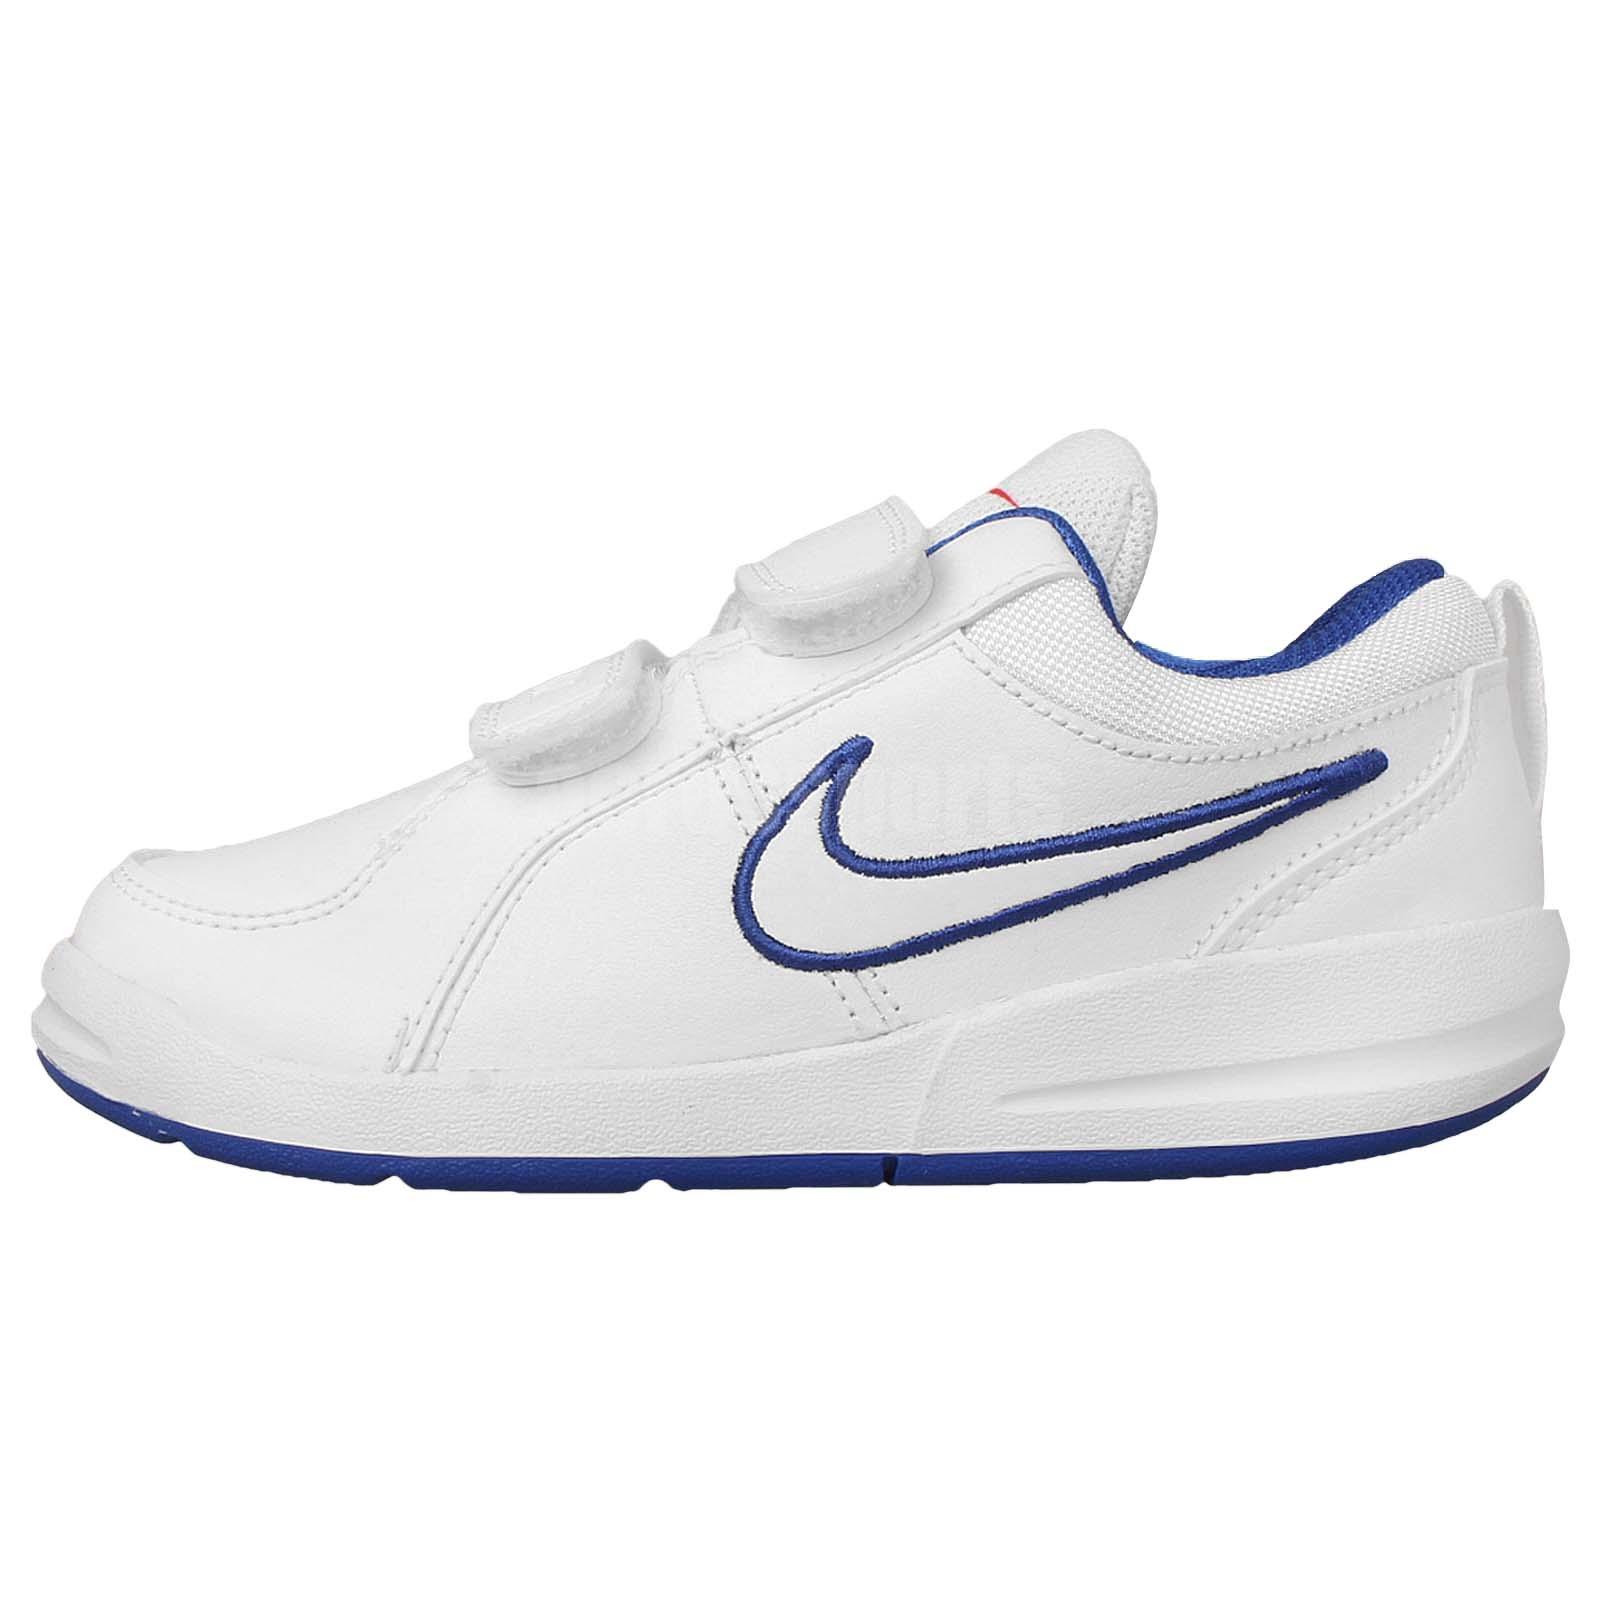 Nike Velcro Shoes White